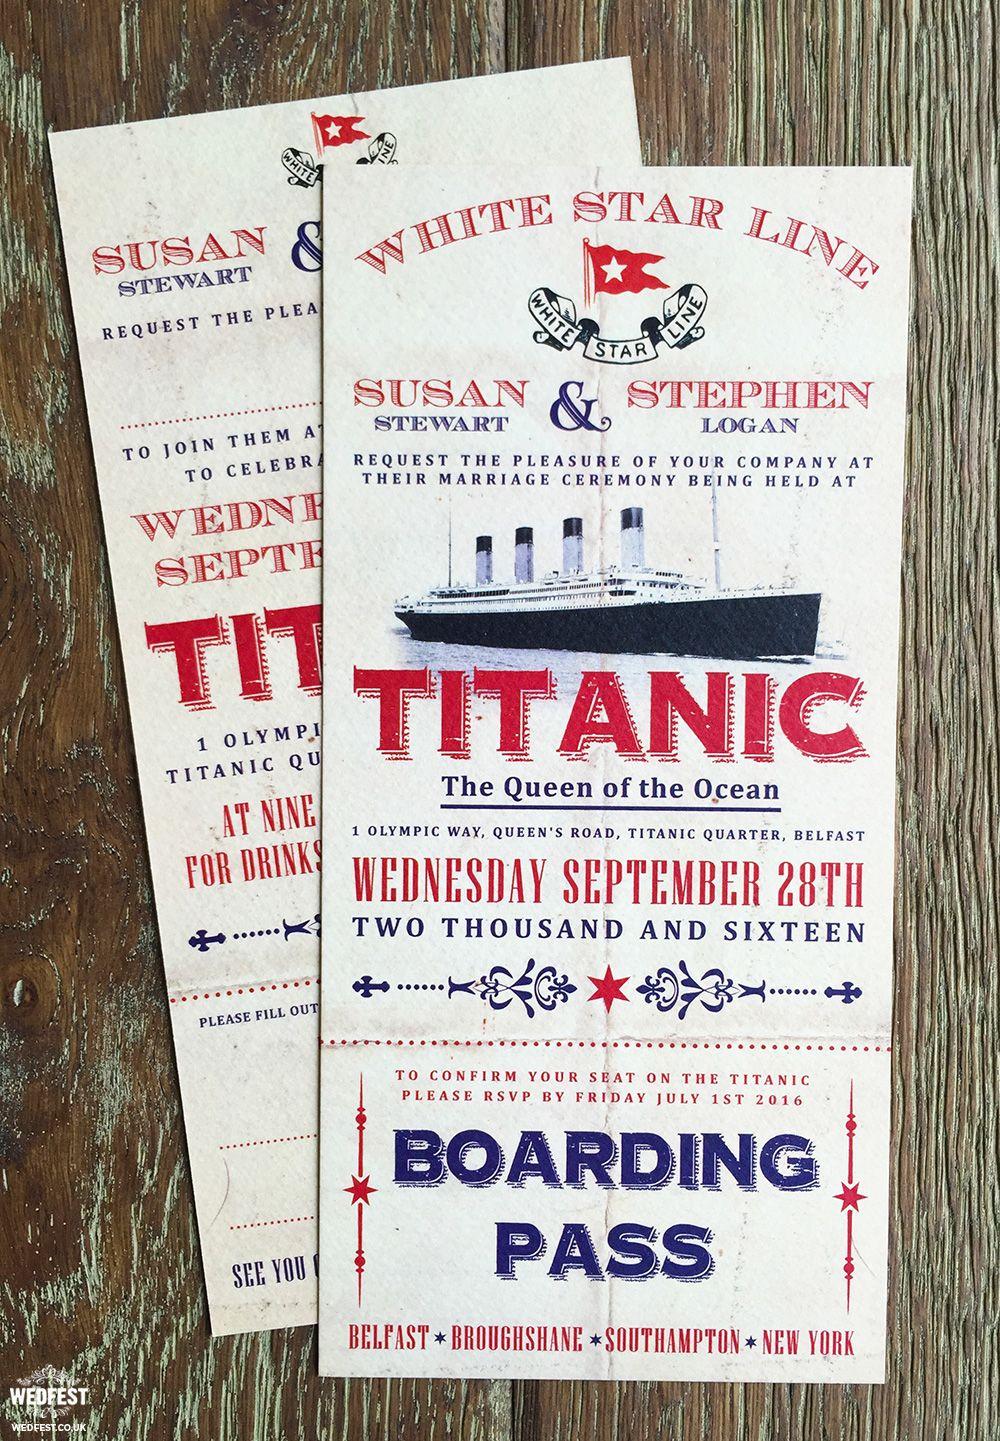 Titanic Themed Wedding Invitations Http Www Wedfest Co Titanic We